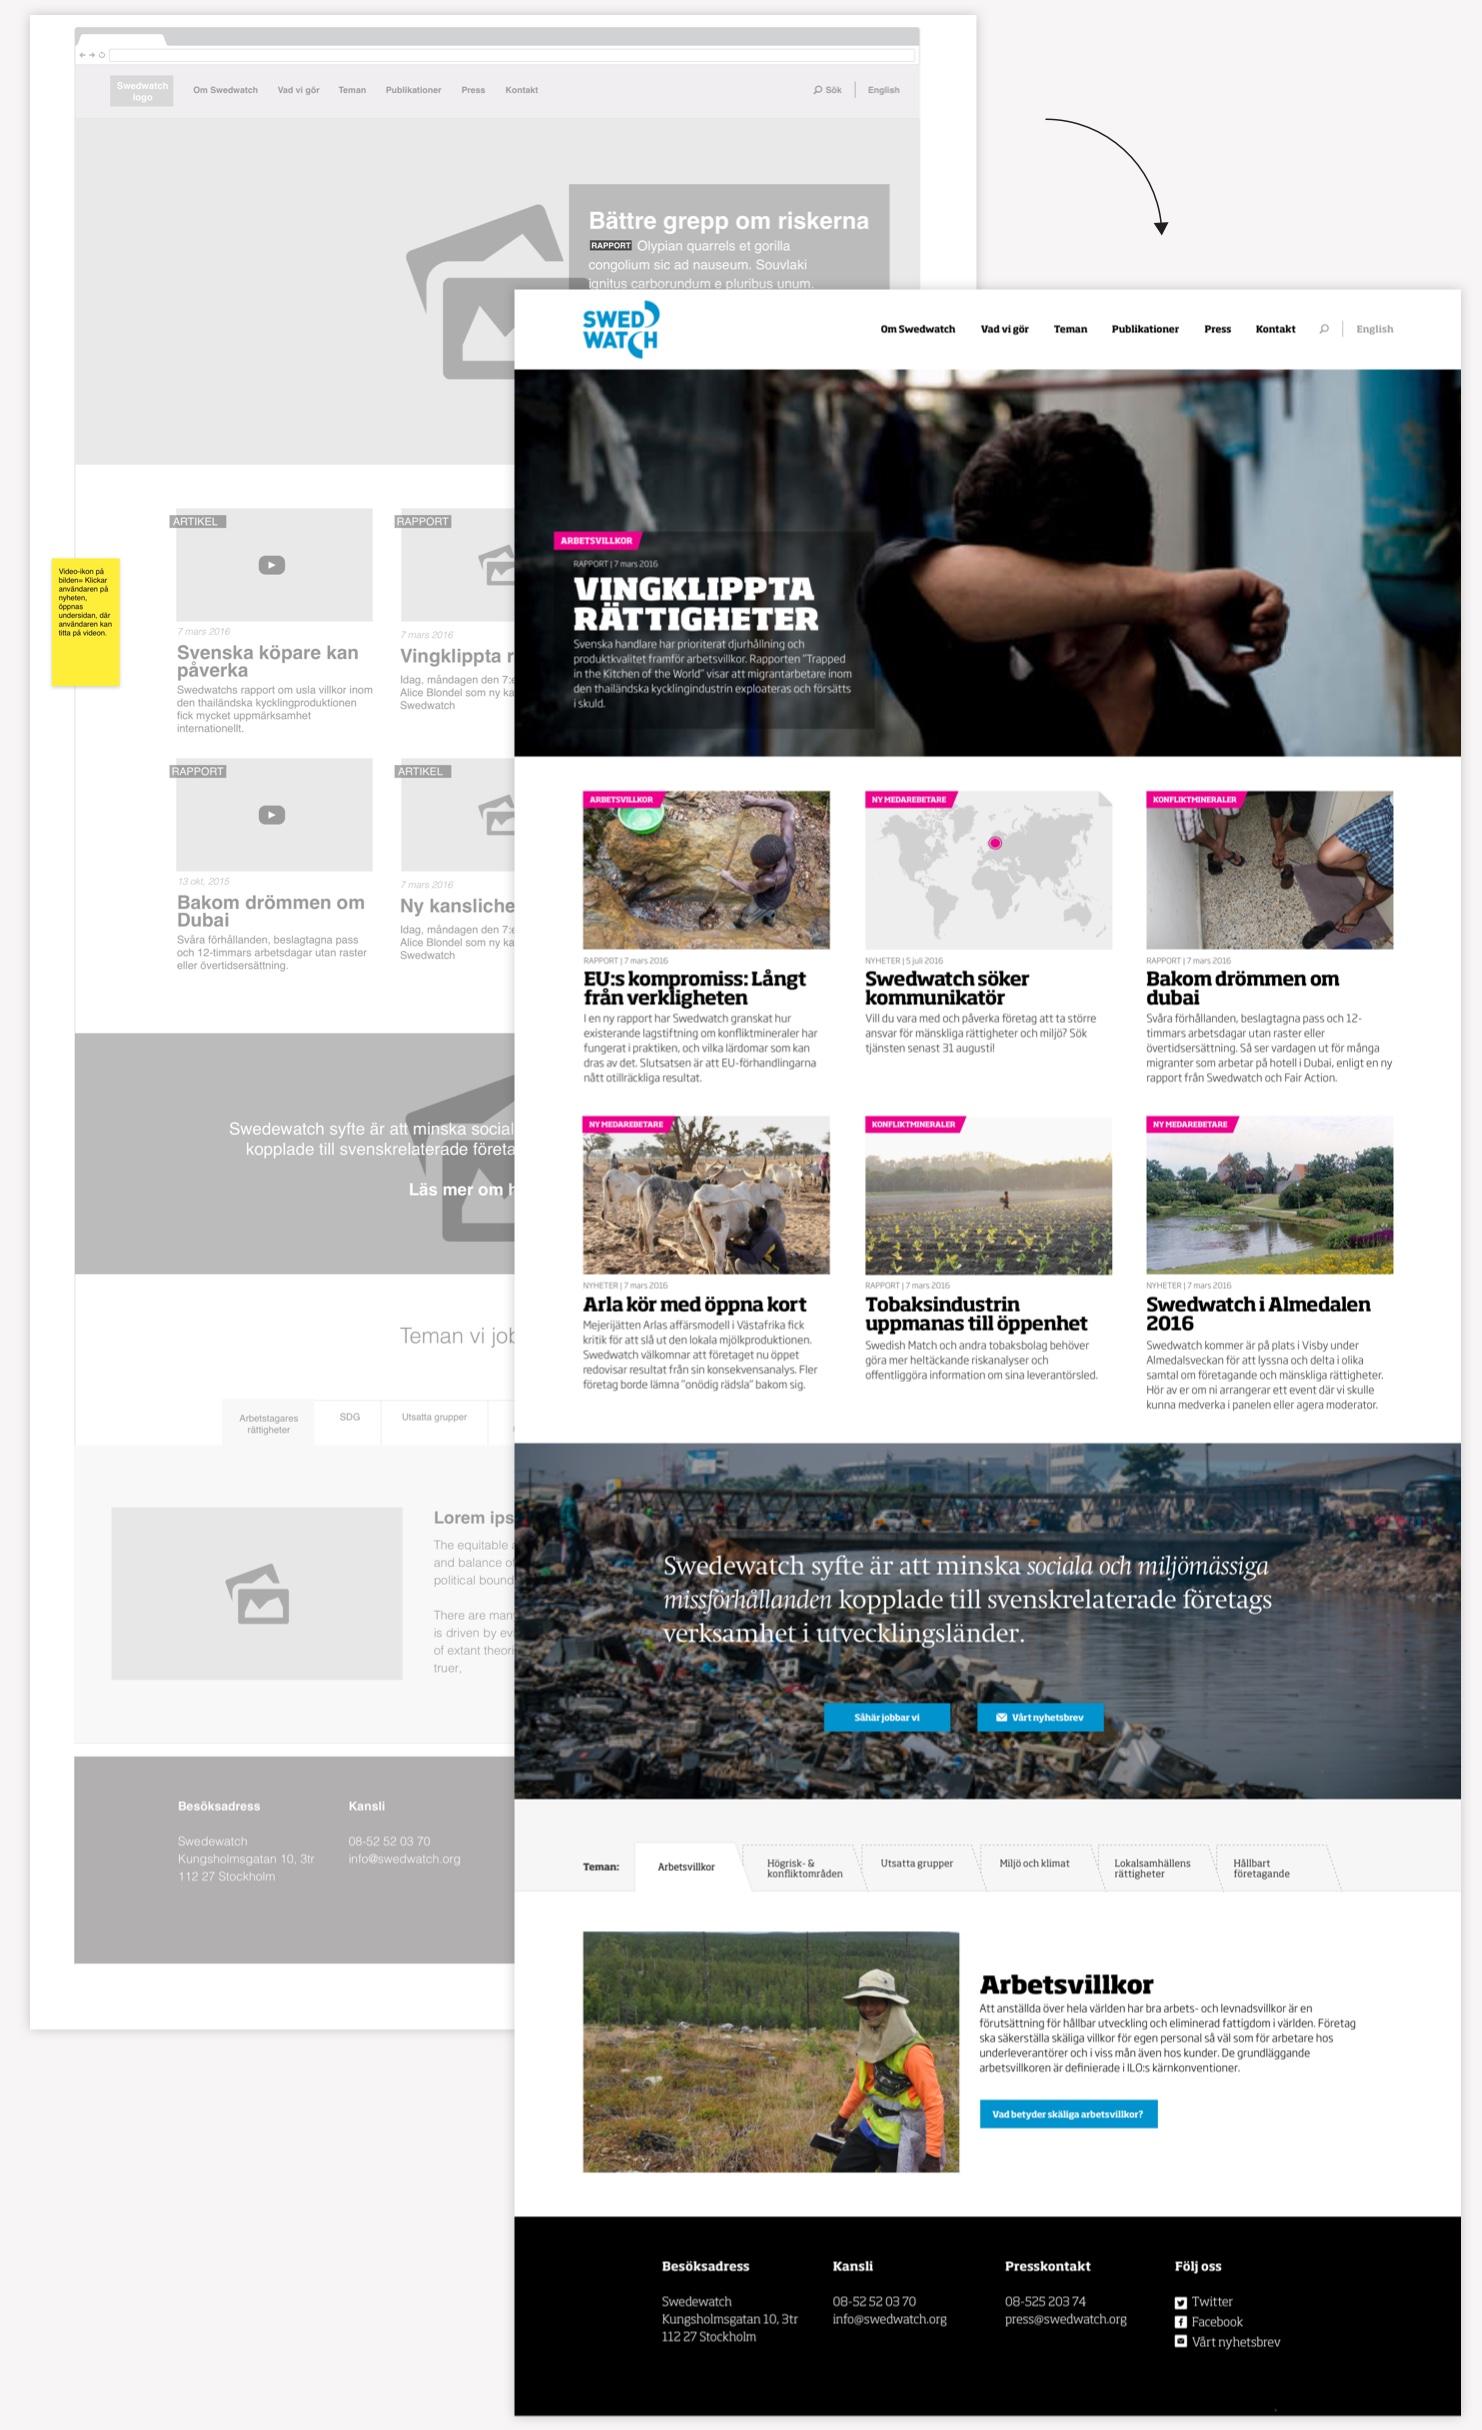 Swedwatch webbplats - wireframe och design